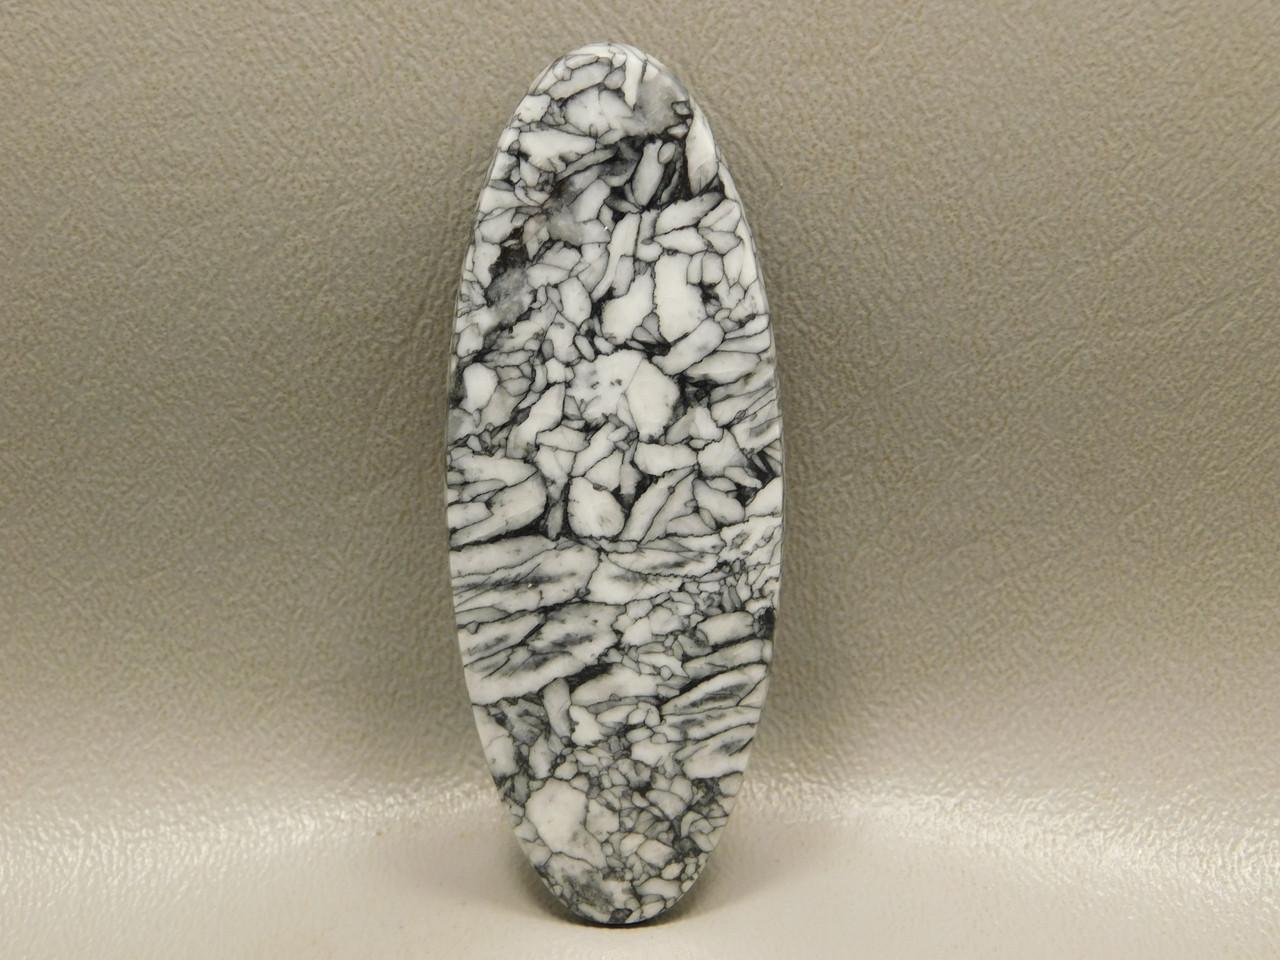 Pinolith or Pinolite Collector Gemstone Oval Cabochon #xl2